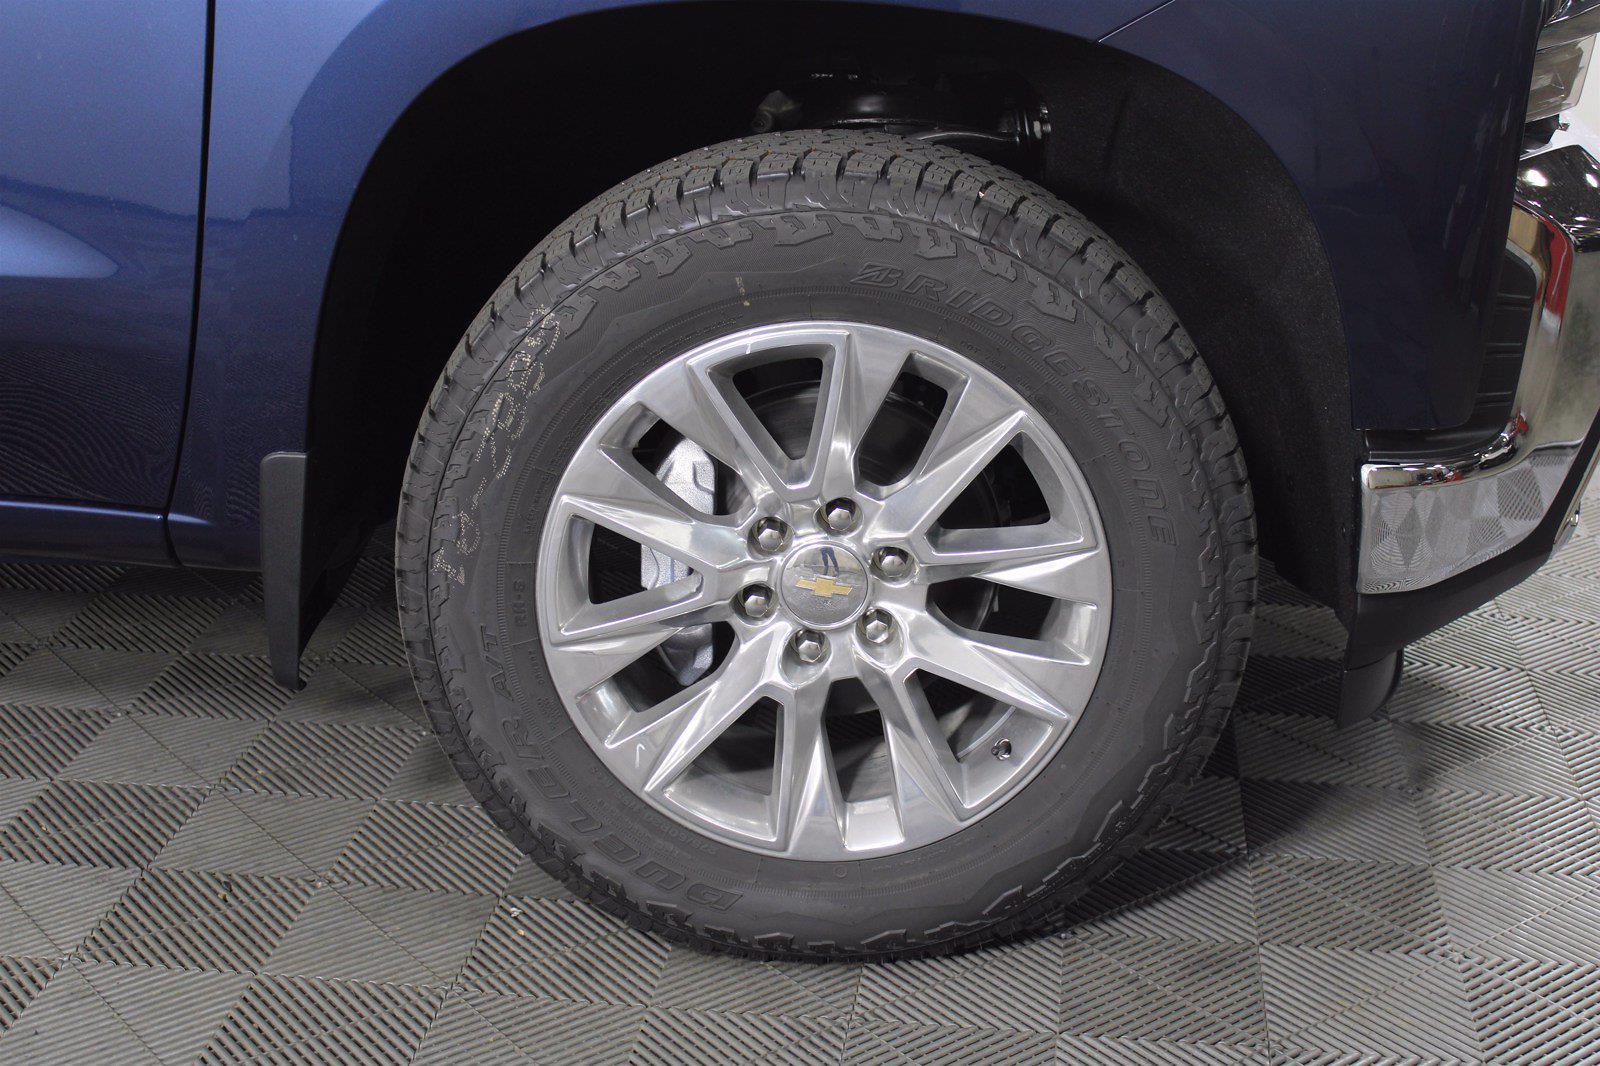 2021 Chevrolet Silverado 1500 Crew Cab 4x4, Pickup #D111155 - photo 6